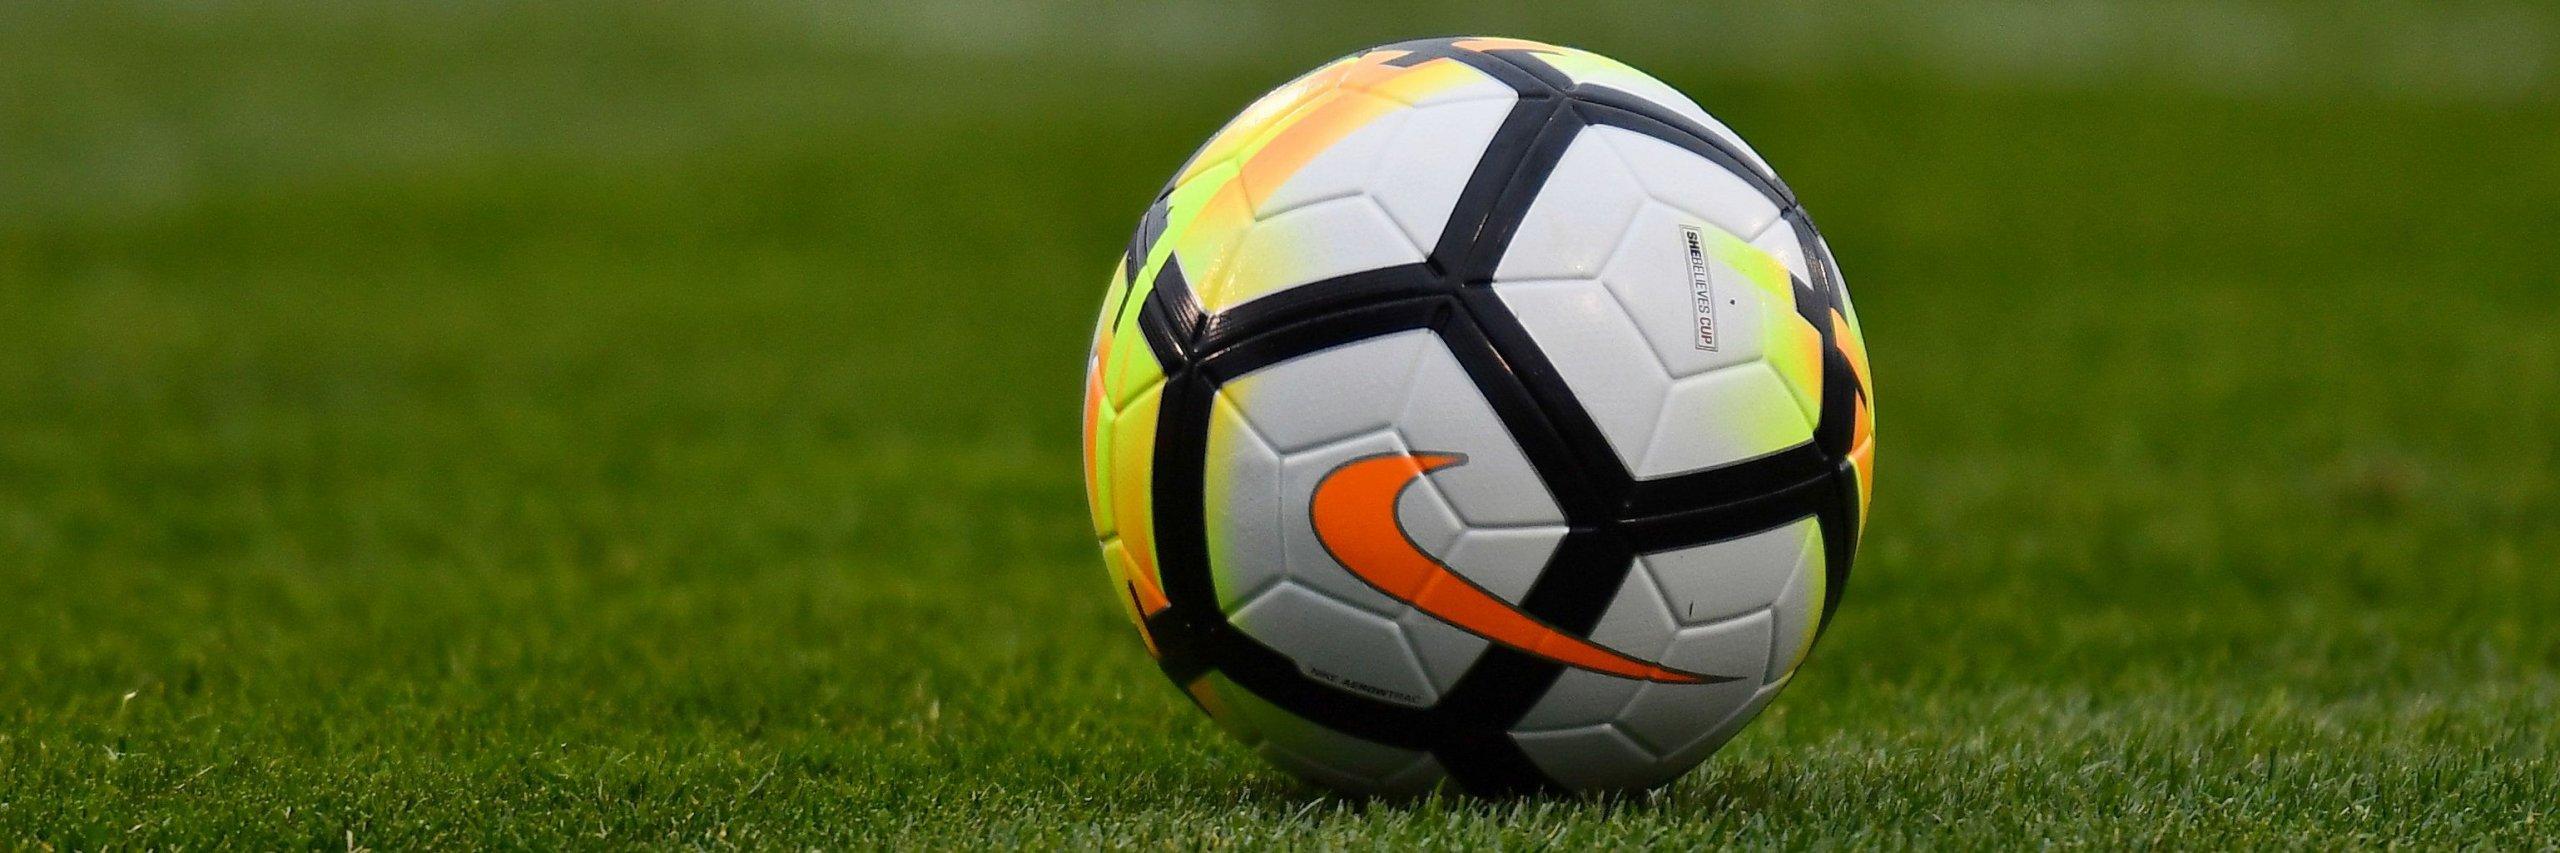 Major Soccer oddsLeagues Estimate Return Dates & Status